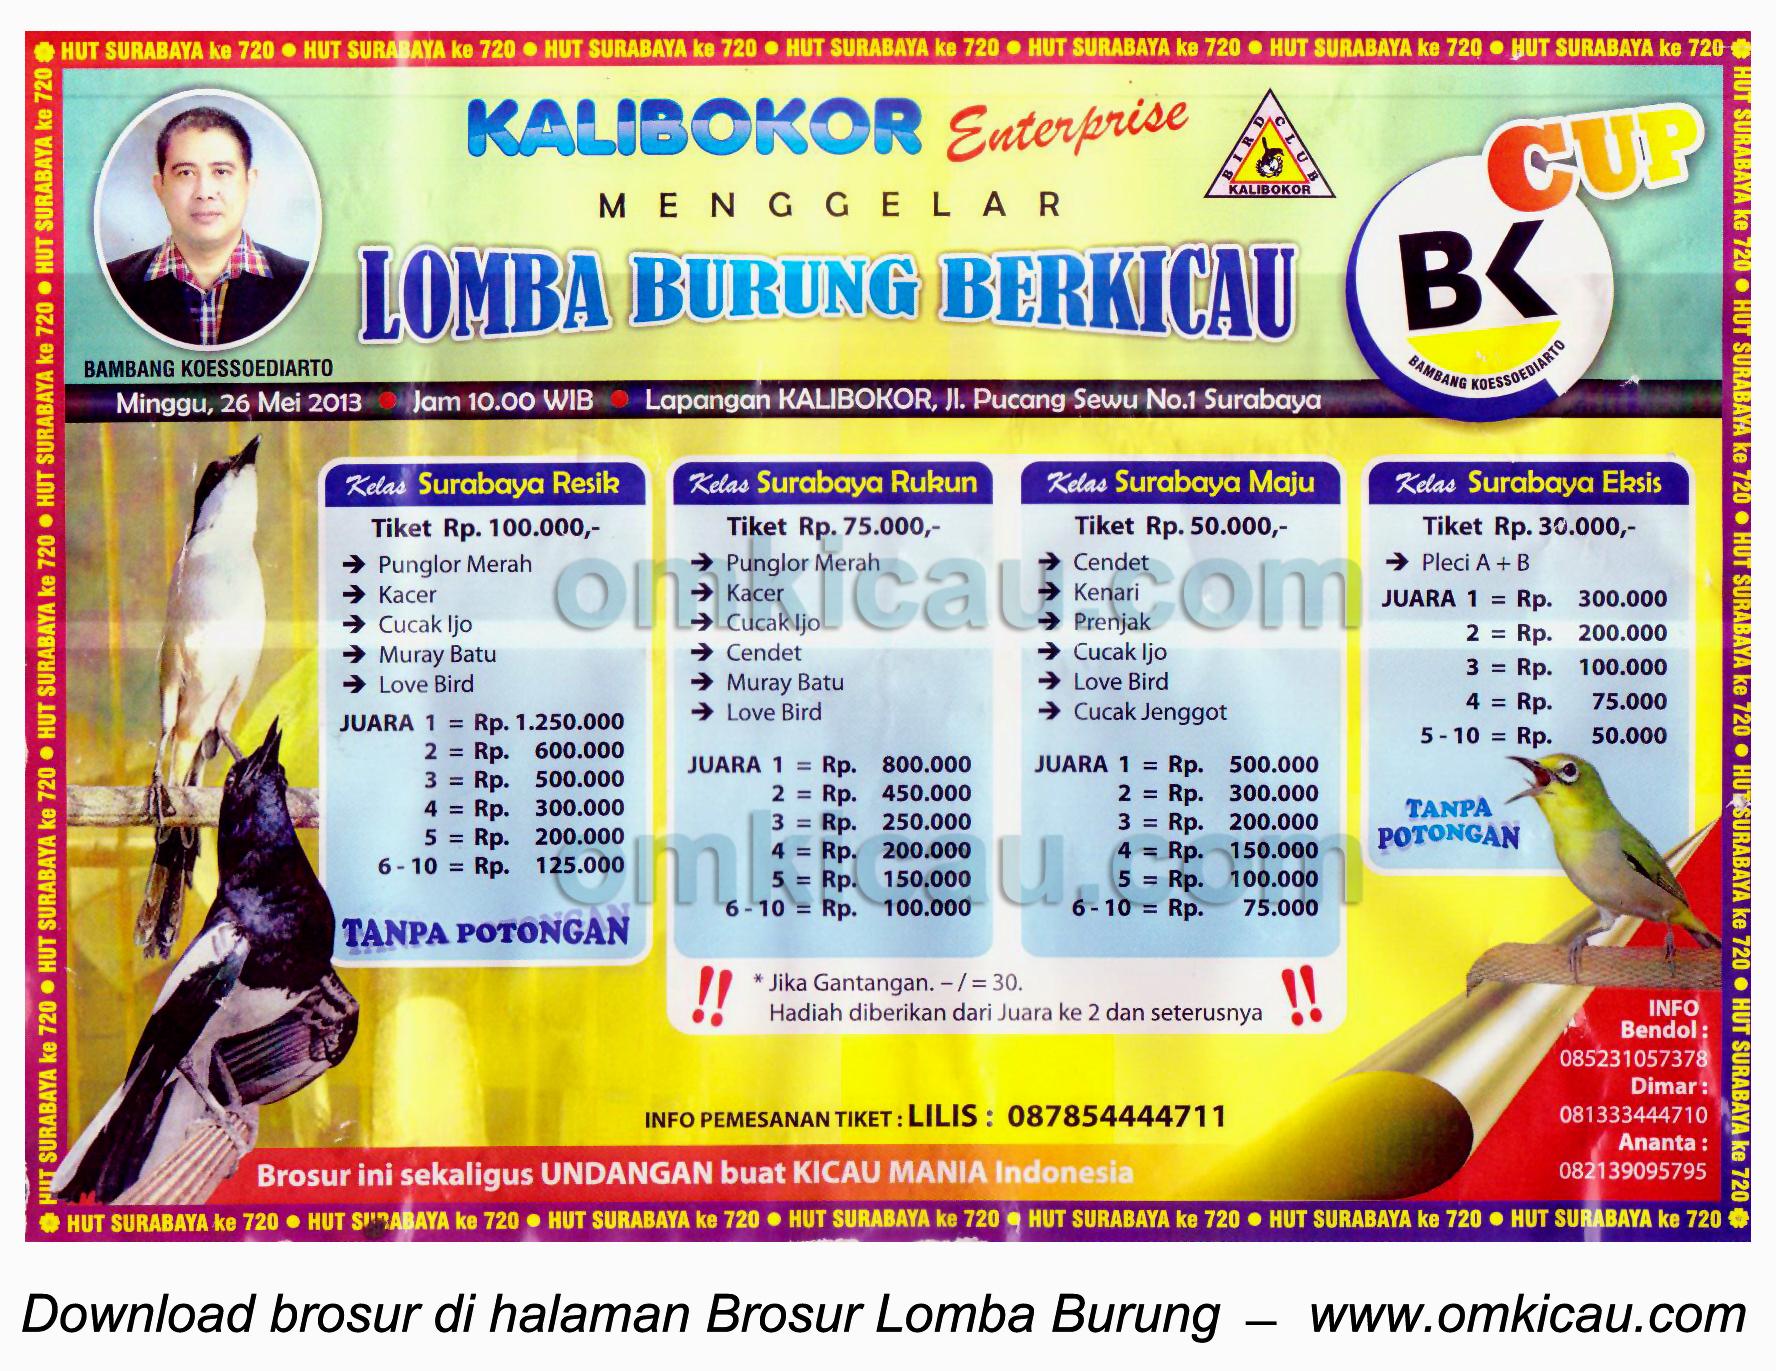 Brosur Lomba Burung BK Cup Surabaya 26 Mei 2013